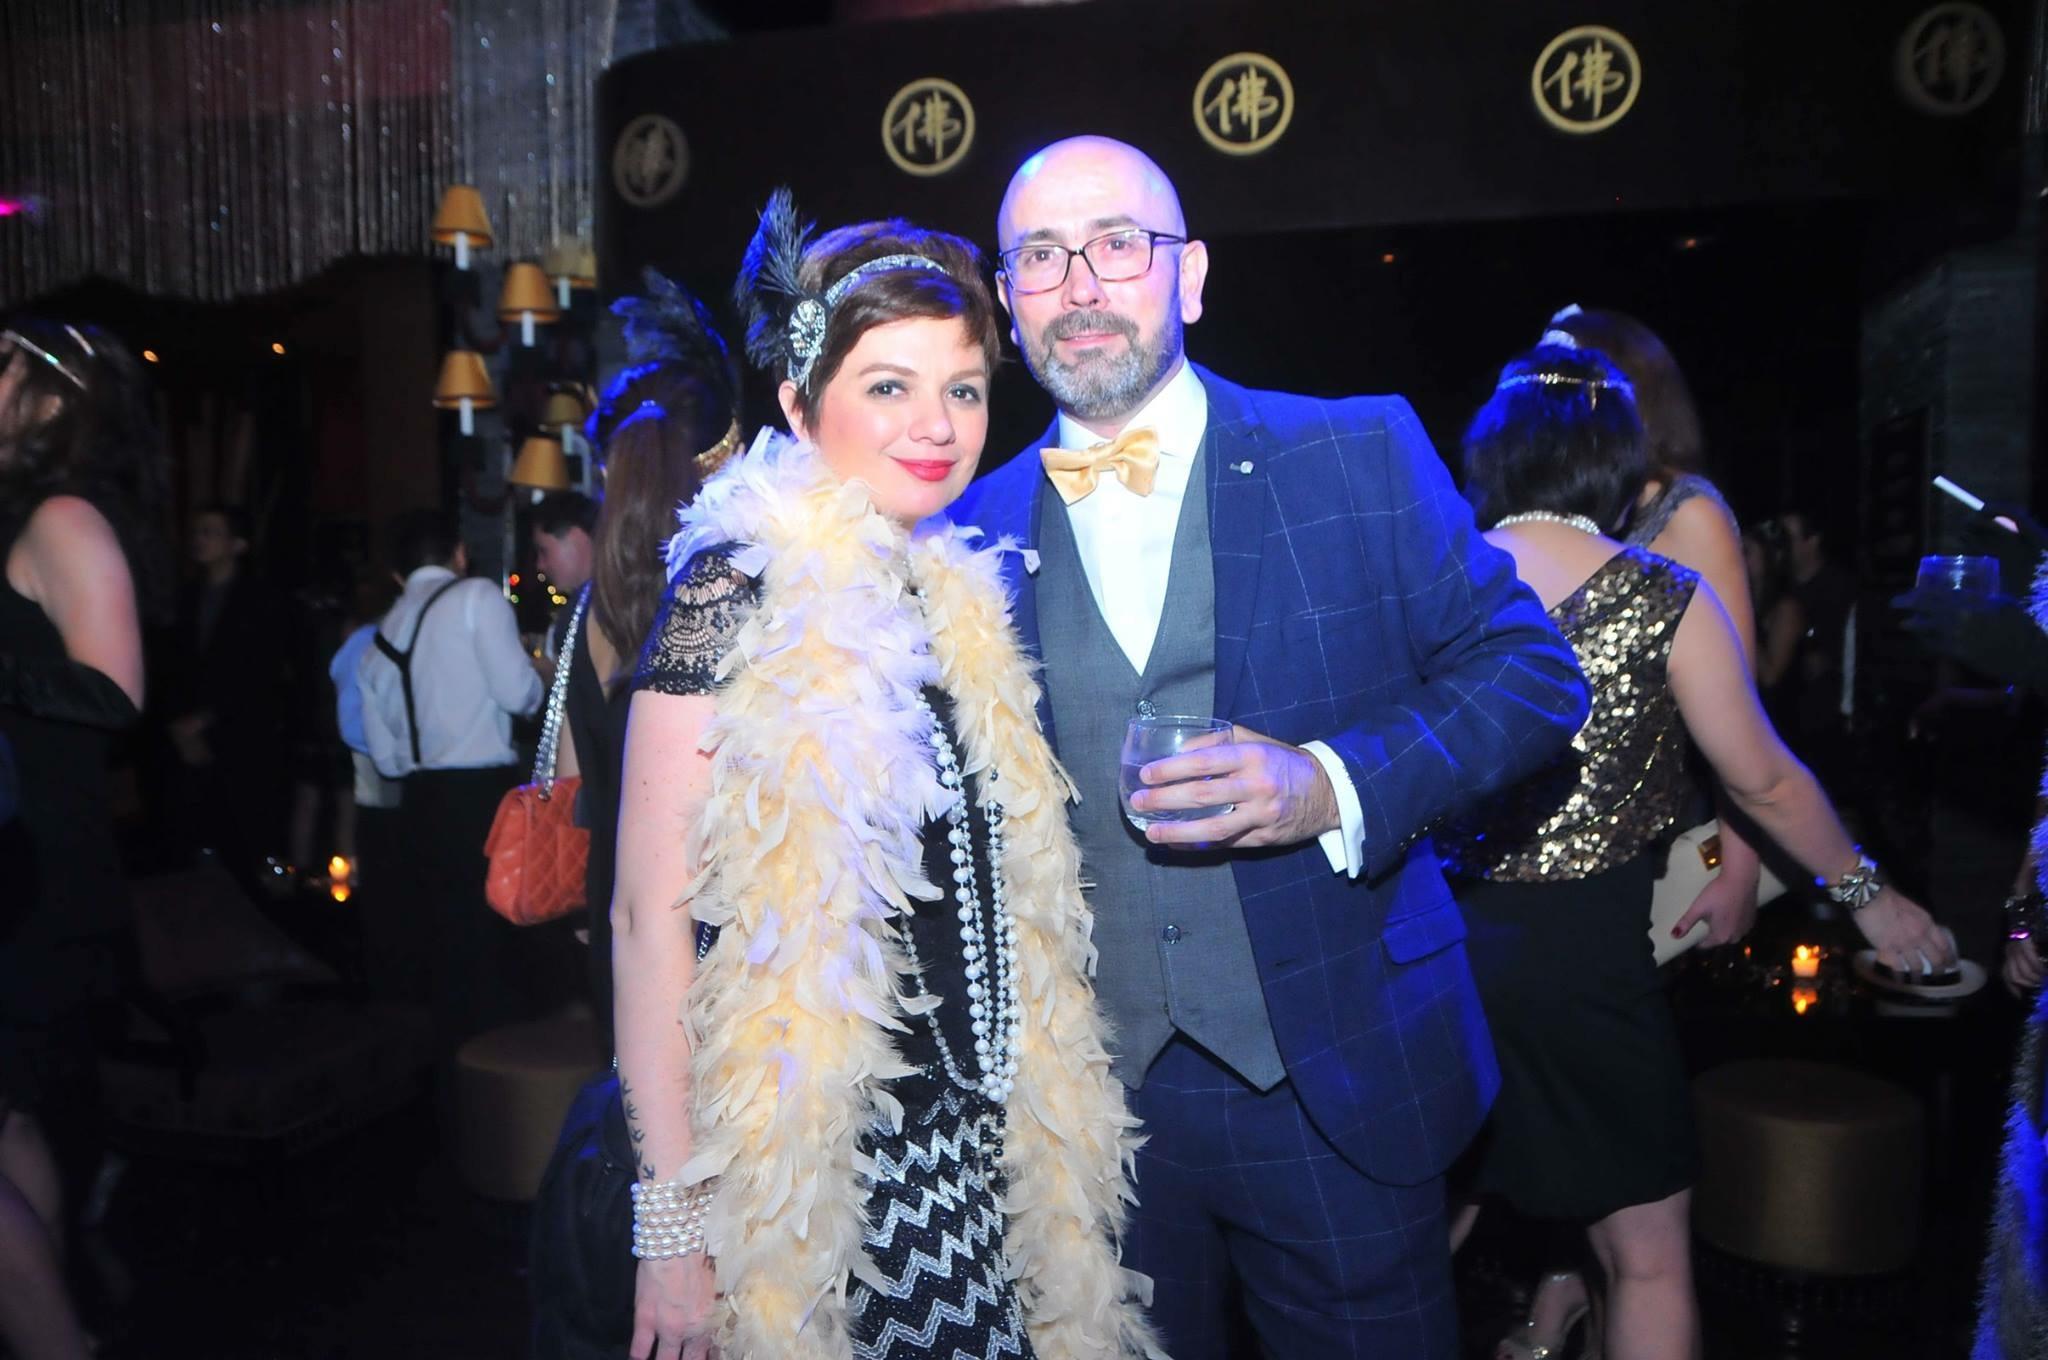 The lovely Lexi and her husband, Javi Berenguer-Testa